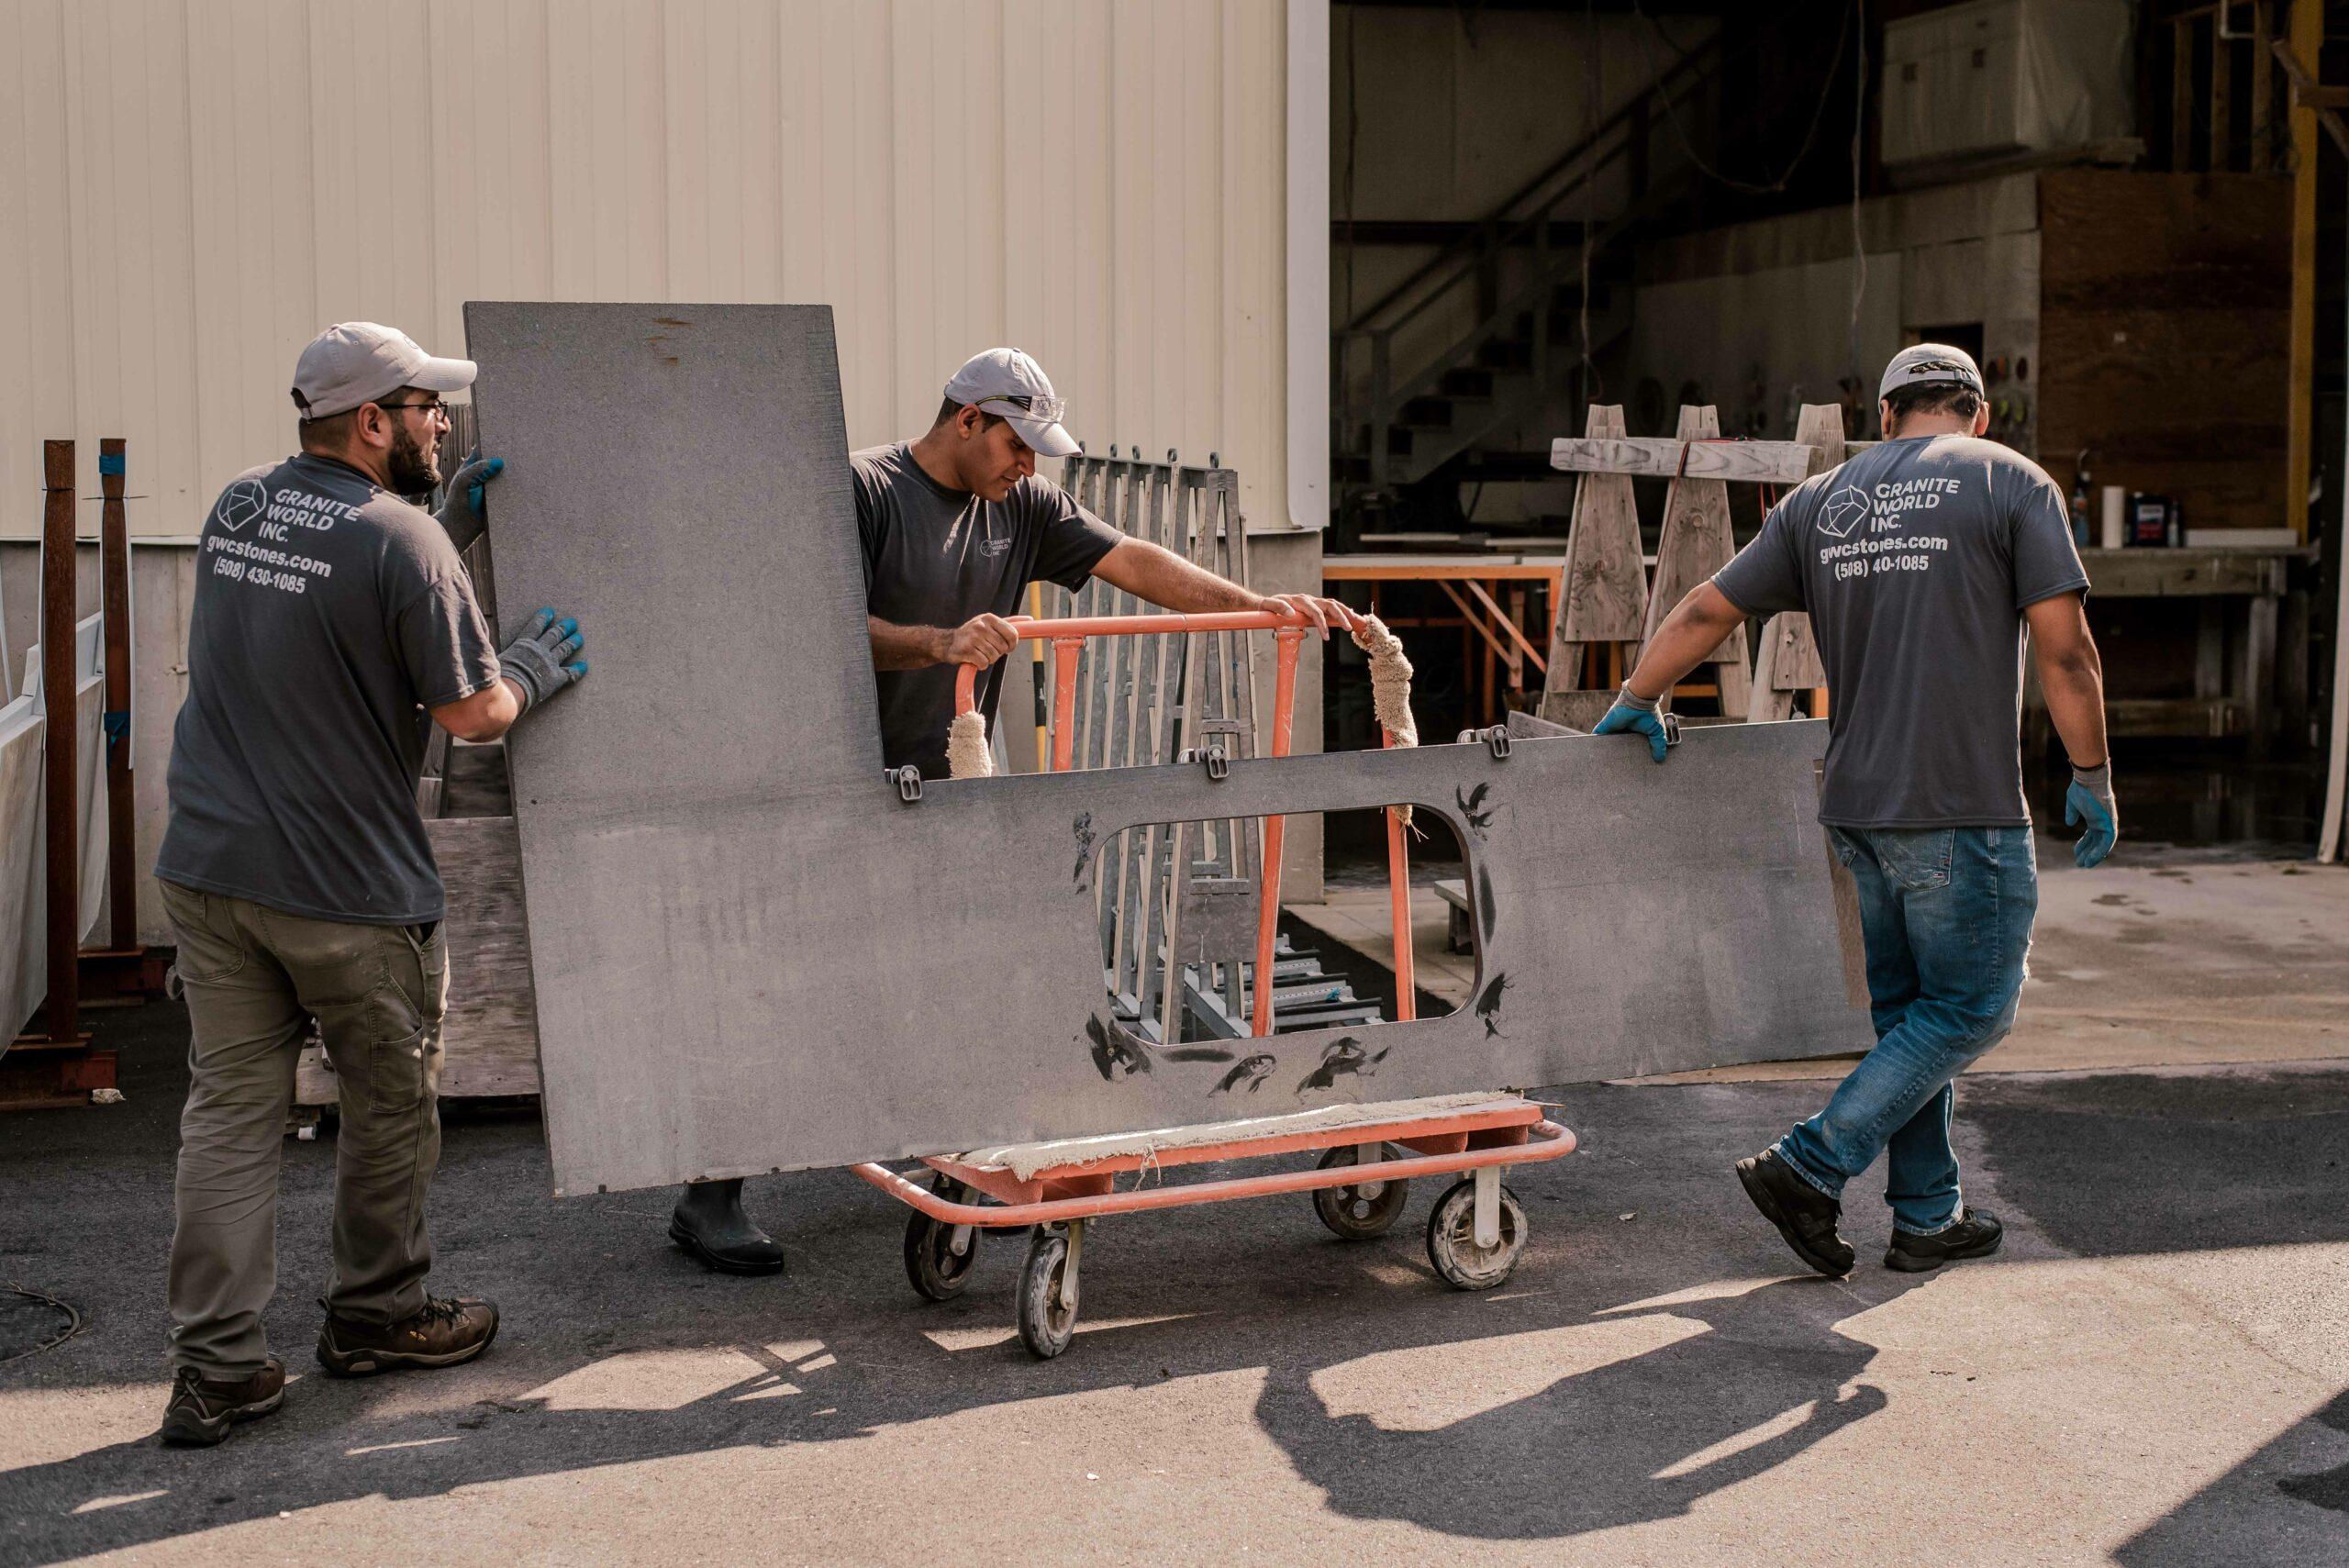 Granite World Employee Working on a countertop fabrication